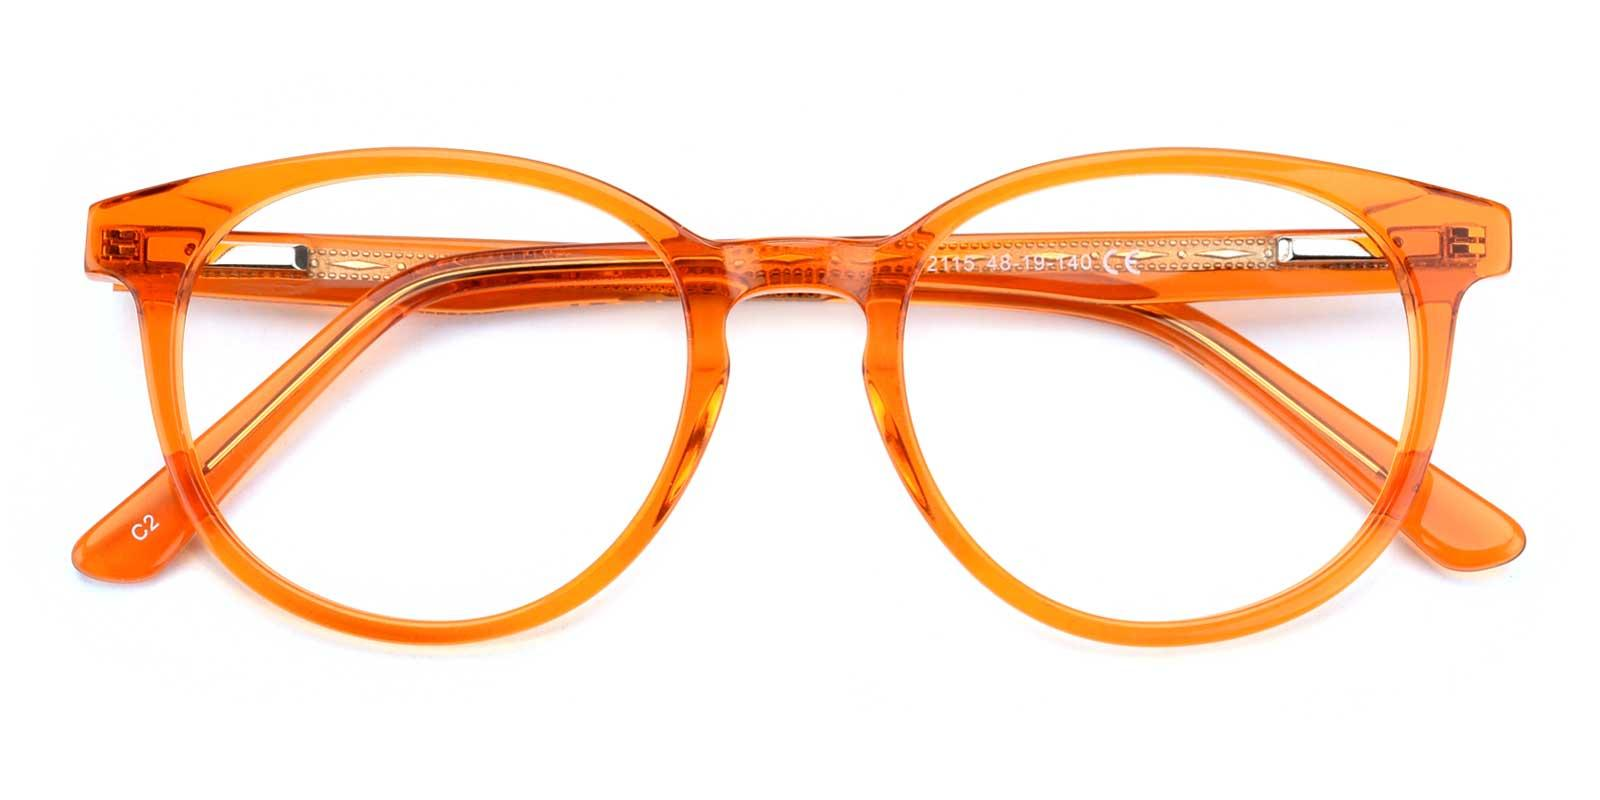 Patti-Orange-Round-Acetate-Eyeglasses-detail